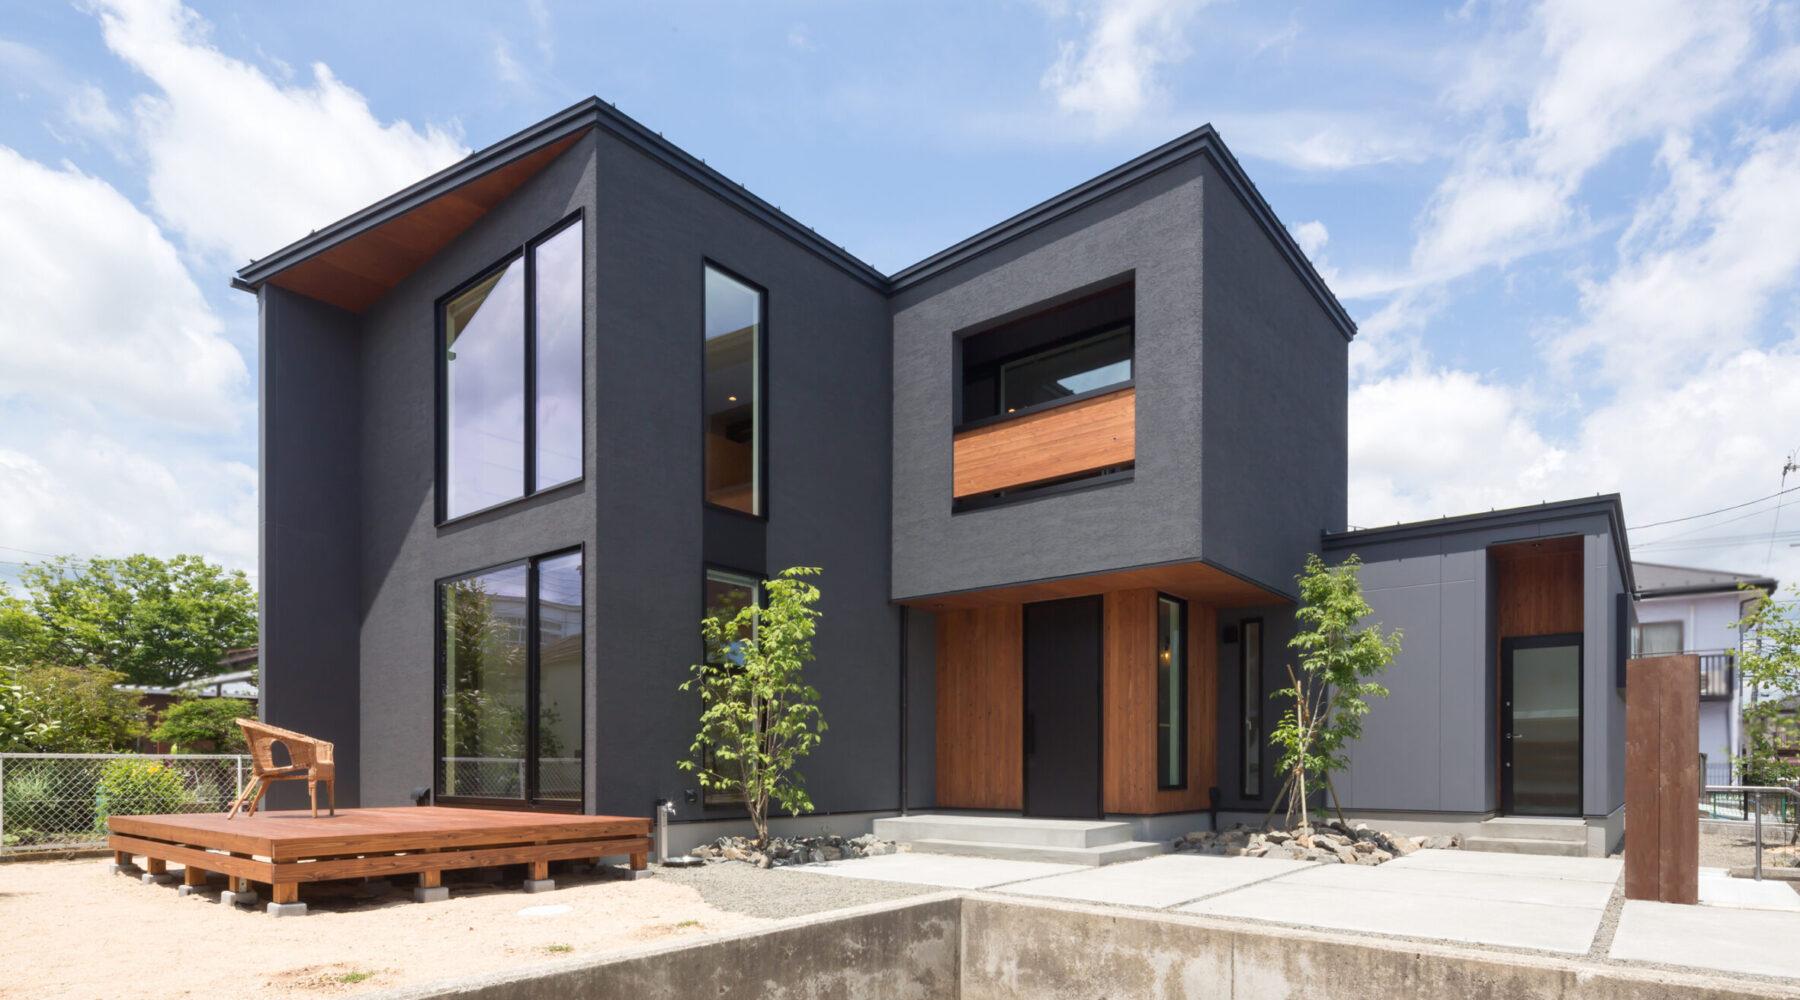 株式会社 建舎団居 STUDIO MADOI 加茂の家 2021/7 竣工